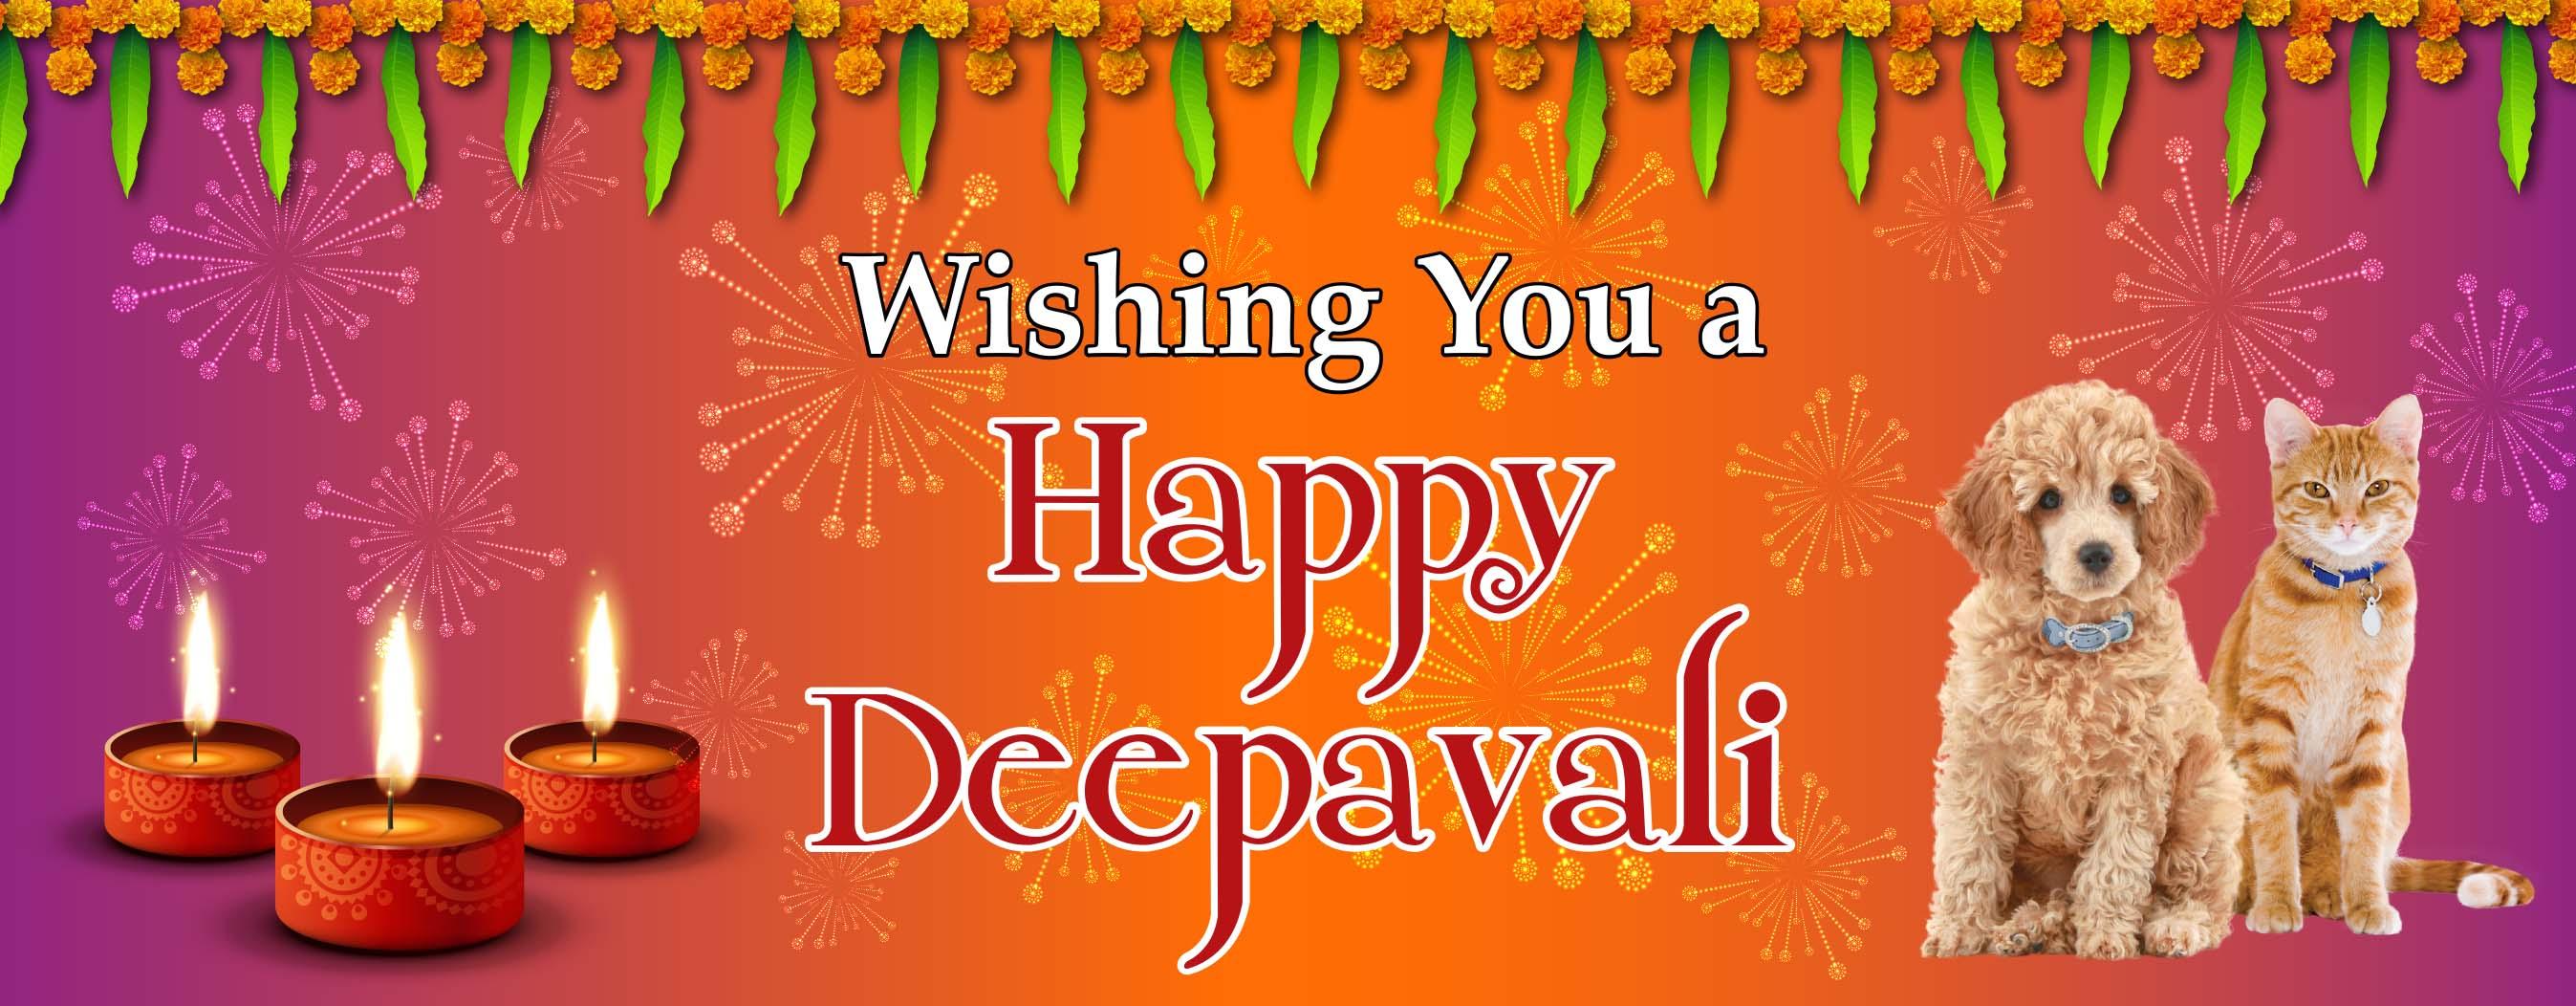 Happy-Diwali-banner-pets-corner